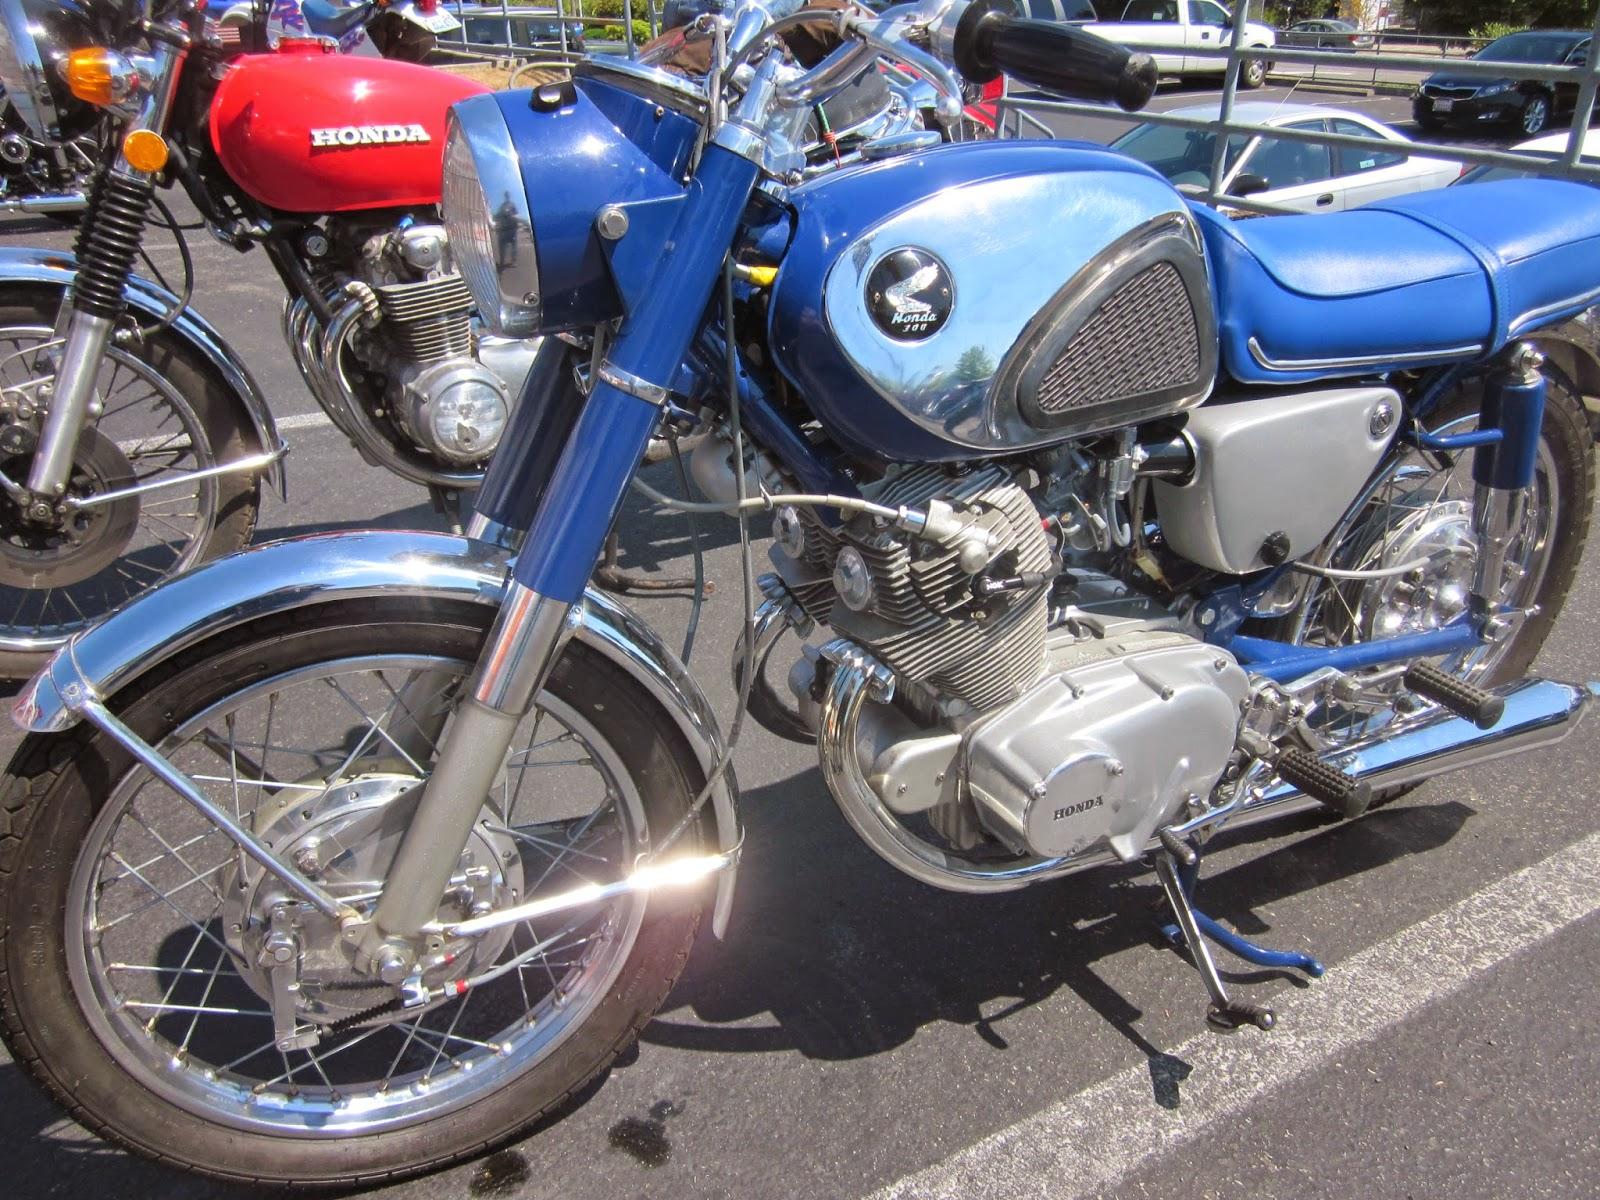 Oldmotodude 1967 305 honda on display at the 2014 vjmc for Hinshaw honda auburn wa